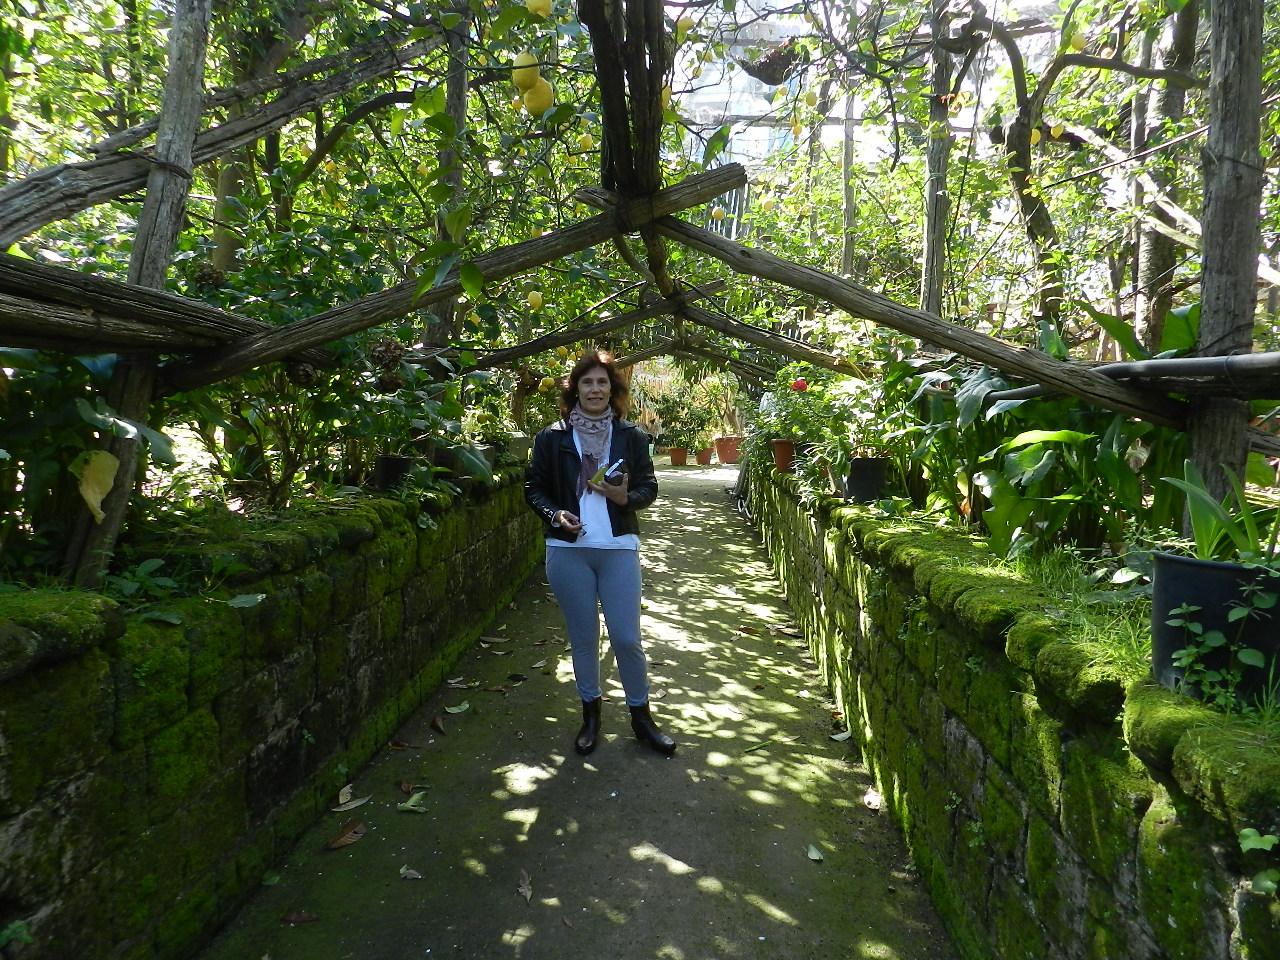 I Giardino di Cataldo - Lair Bachieg